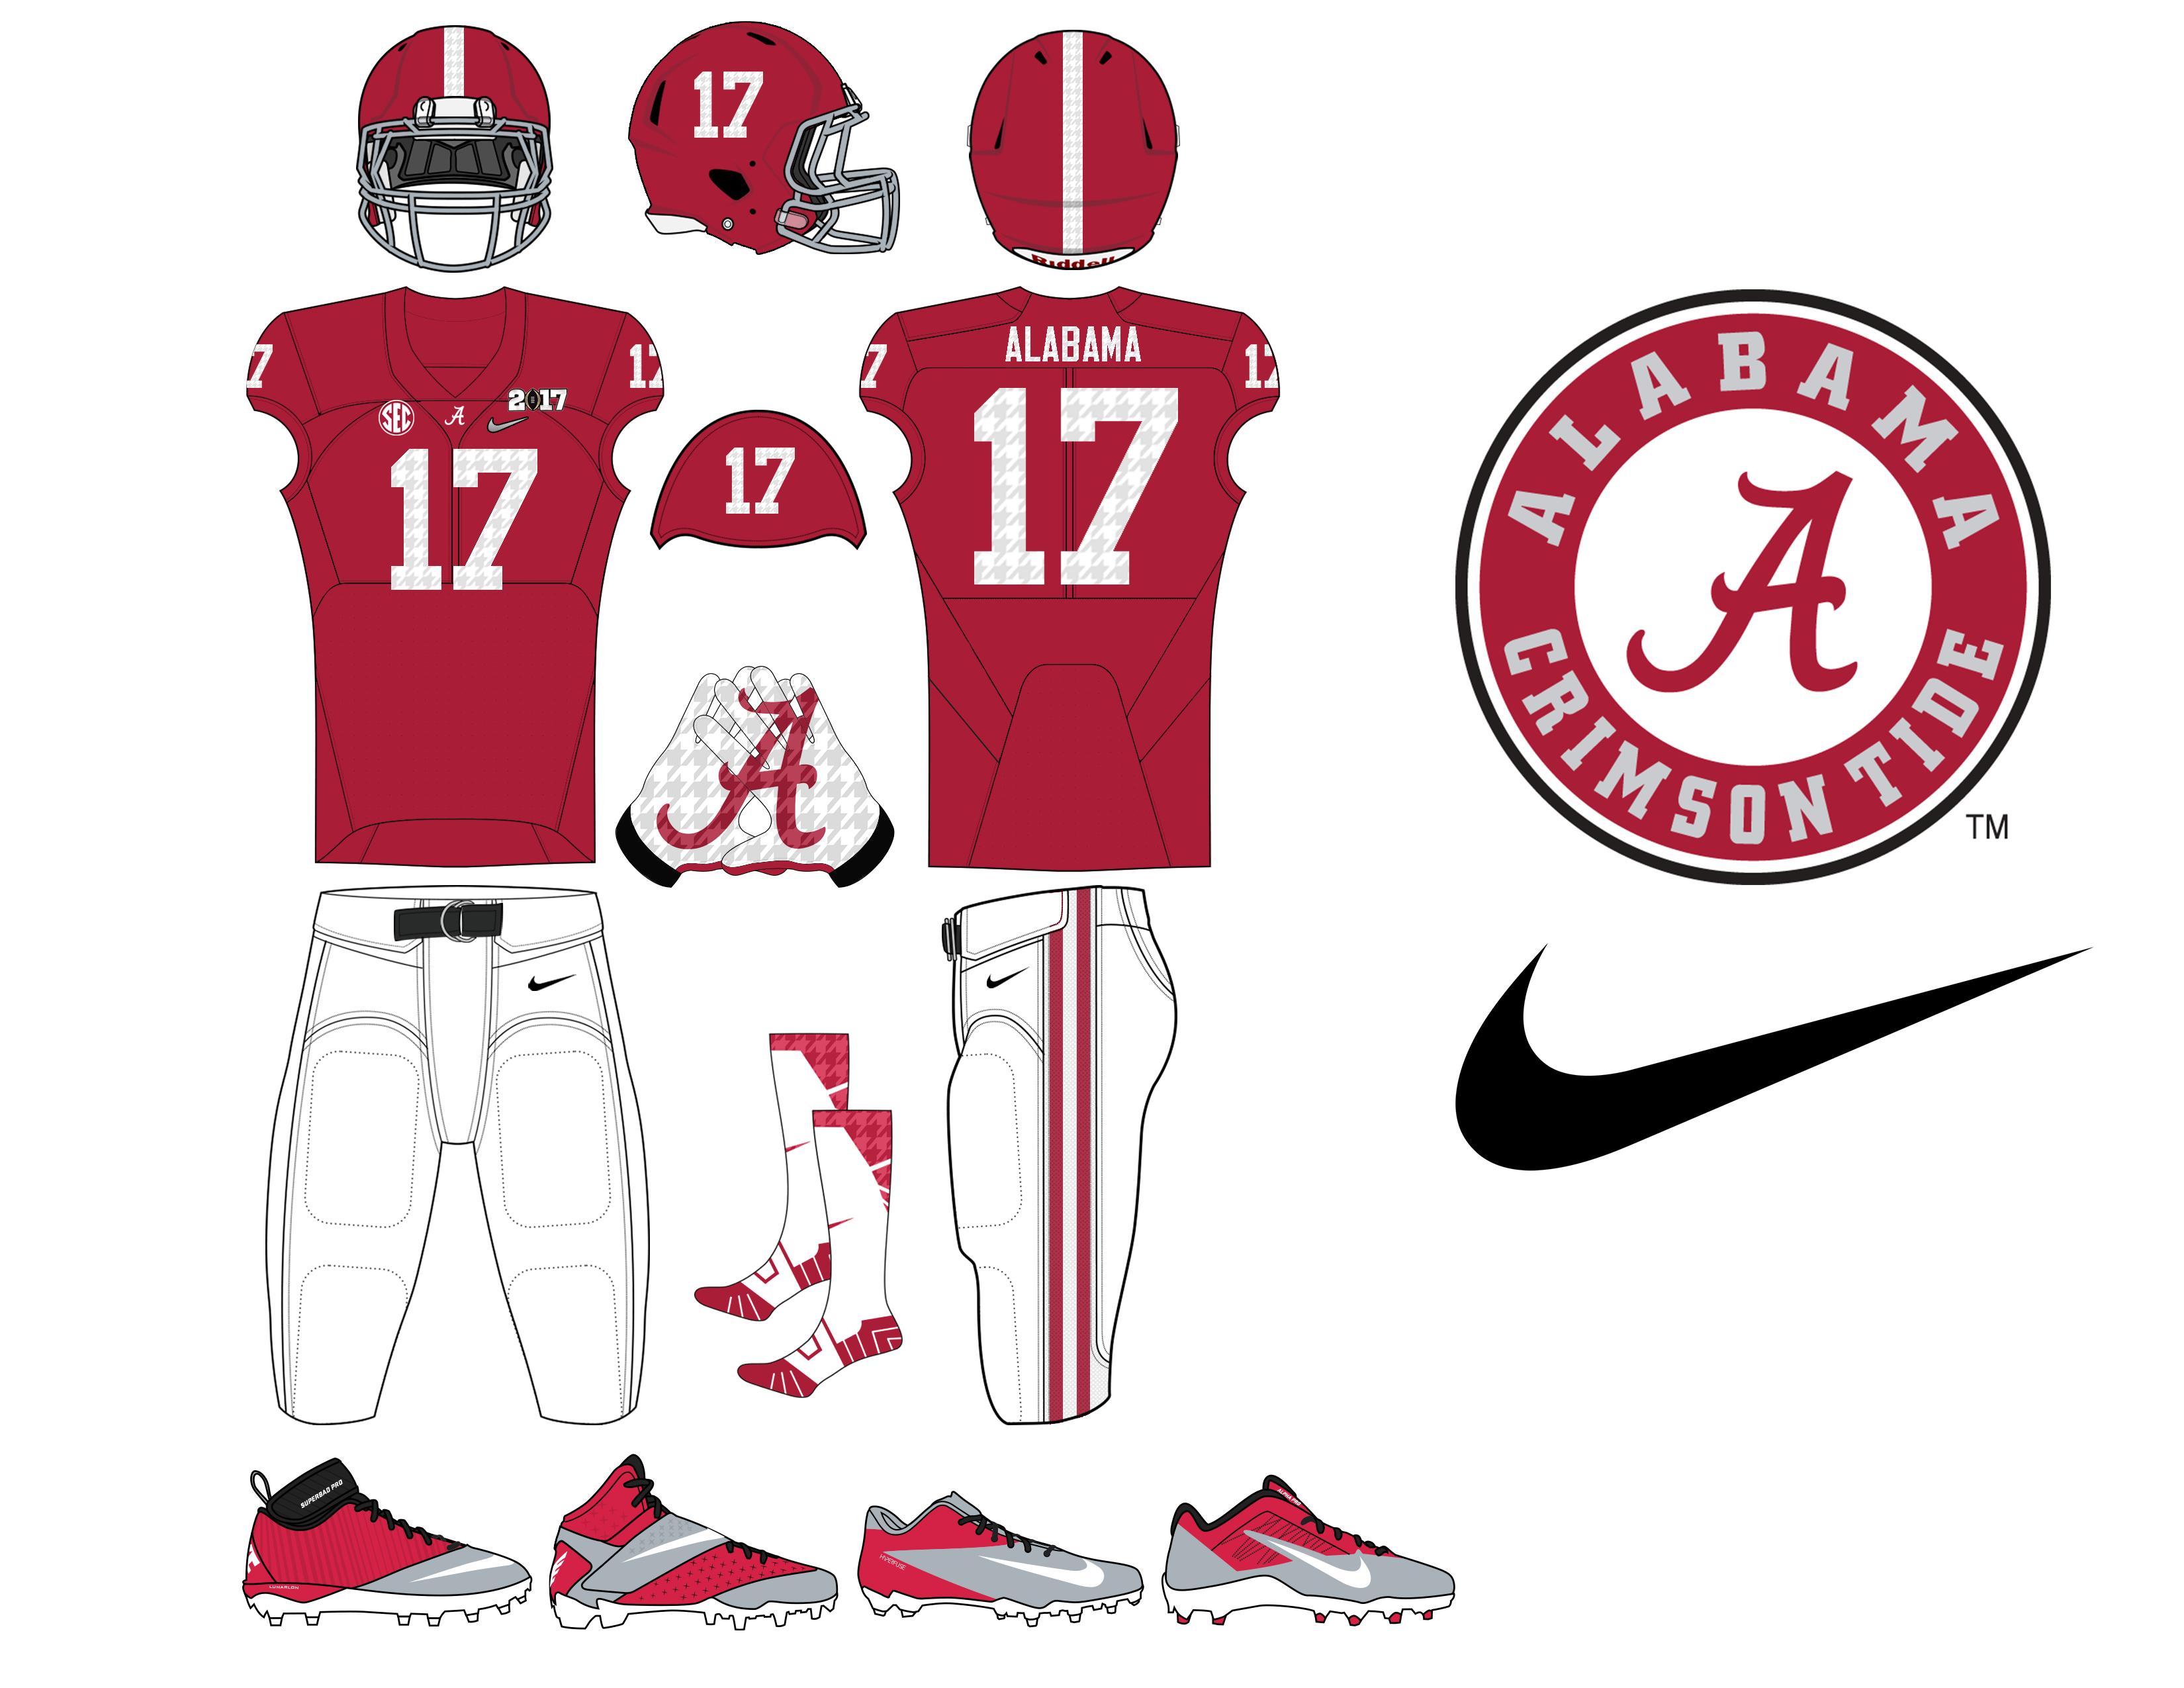 936b31d48e4 2017 College Football Playoff Uniforms - Concepts - Chris Creamer's ...